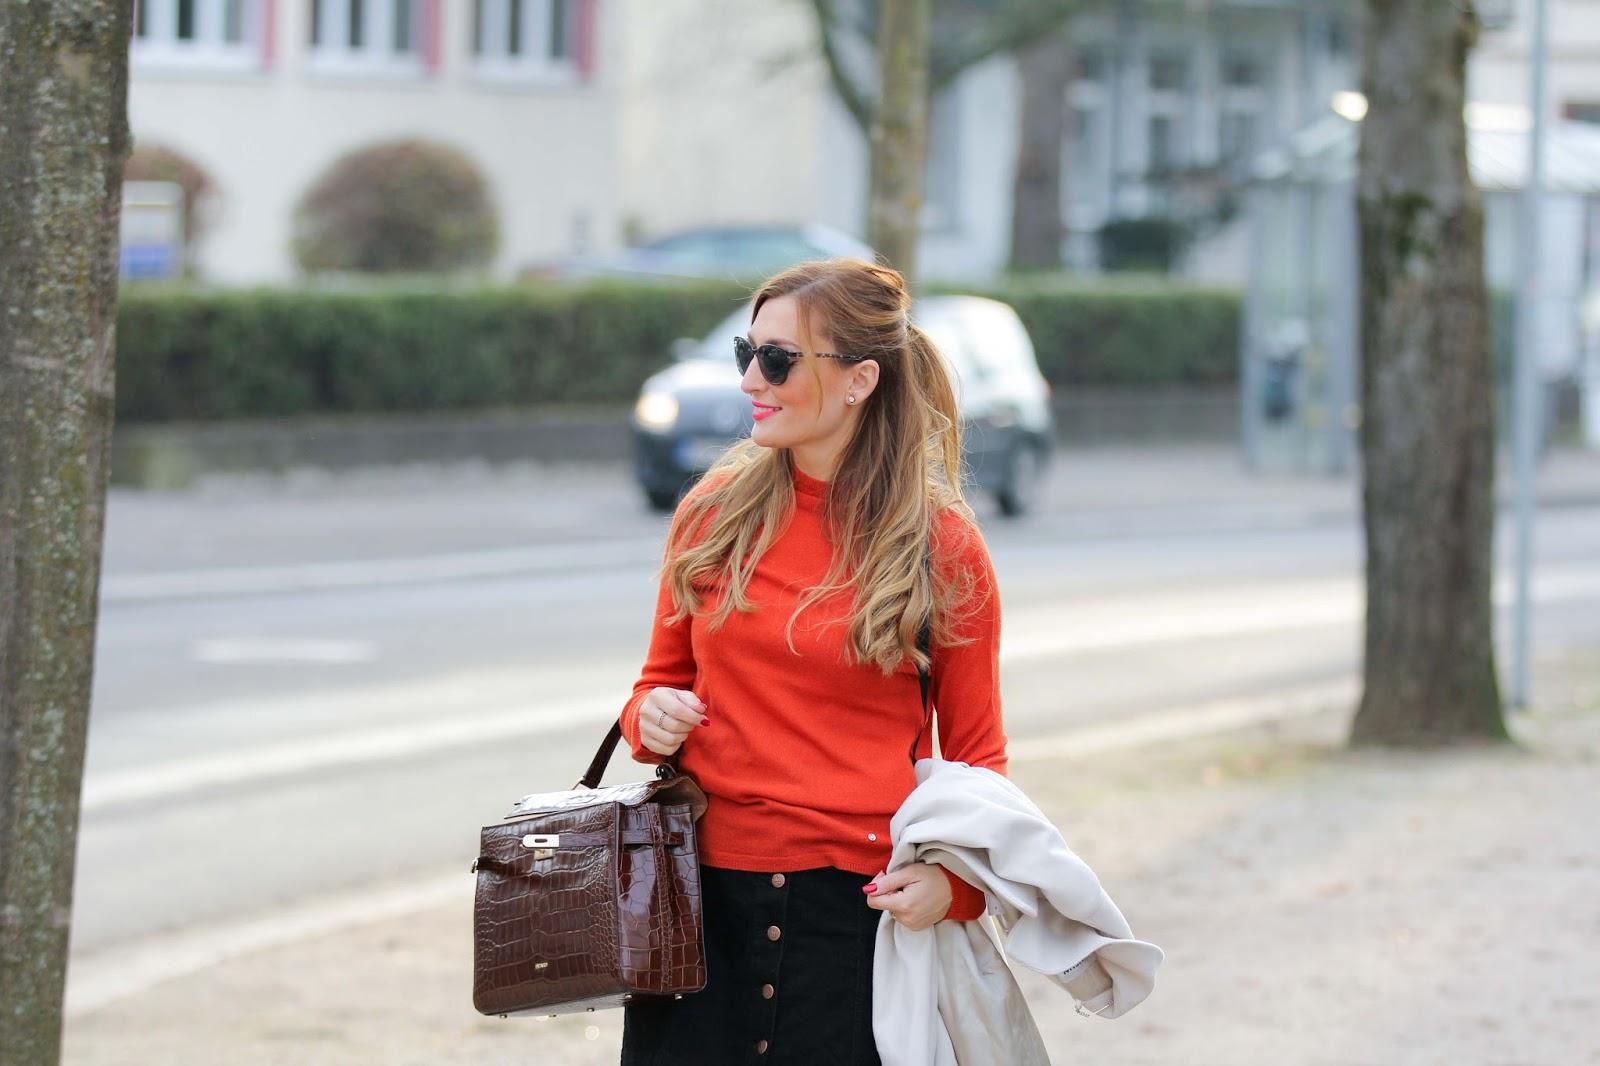 Black-Overknees-Gerry-Weber-creme-Mantel-Rock-mit-knöpfen-orangener-Pullover-Streetstyle-Streetstyleblogger-Fashionstylebyjohanna